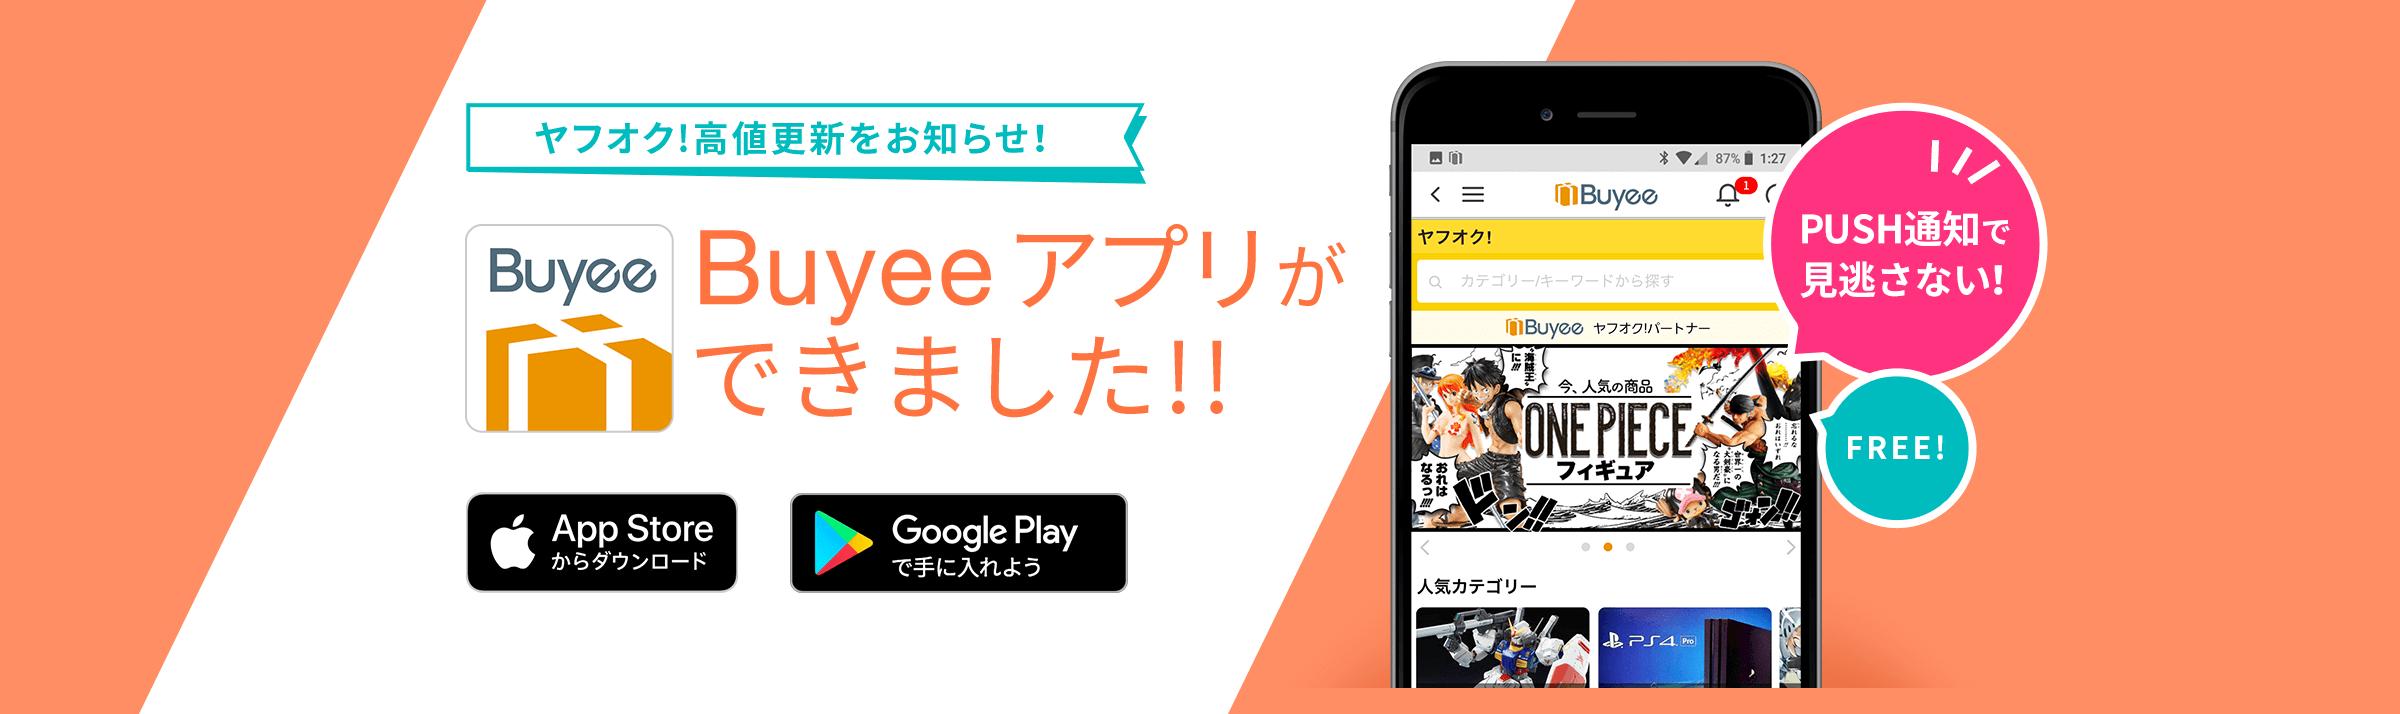 Buyee アプリができました!!